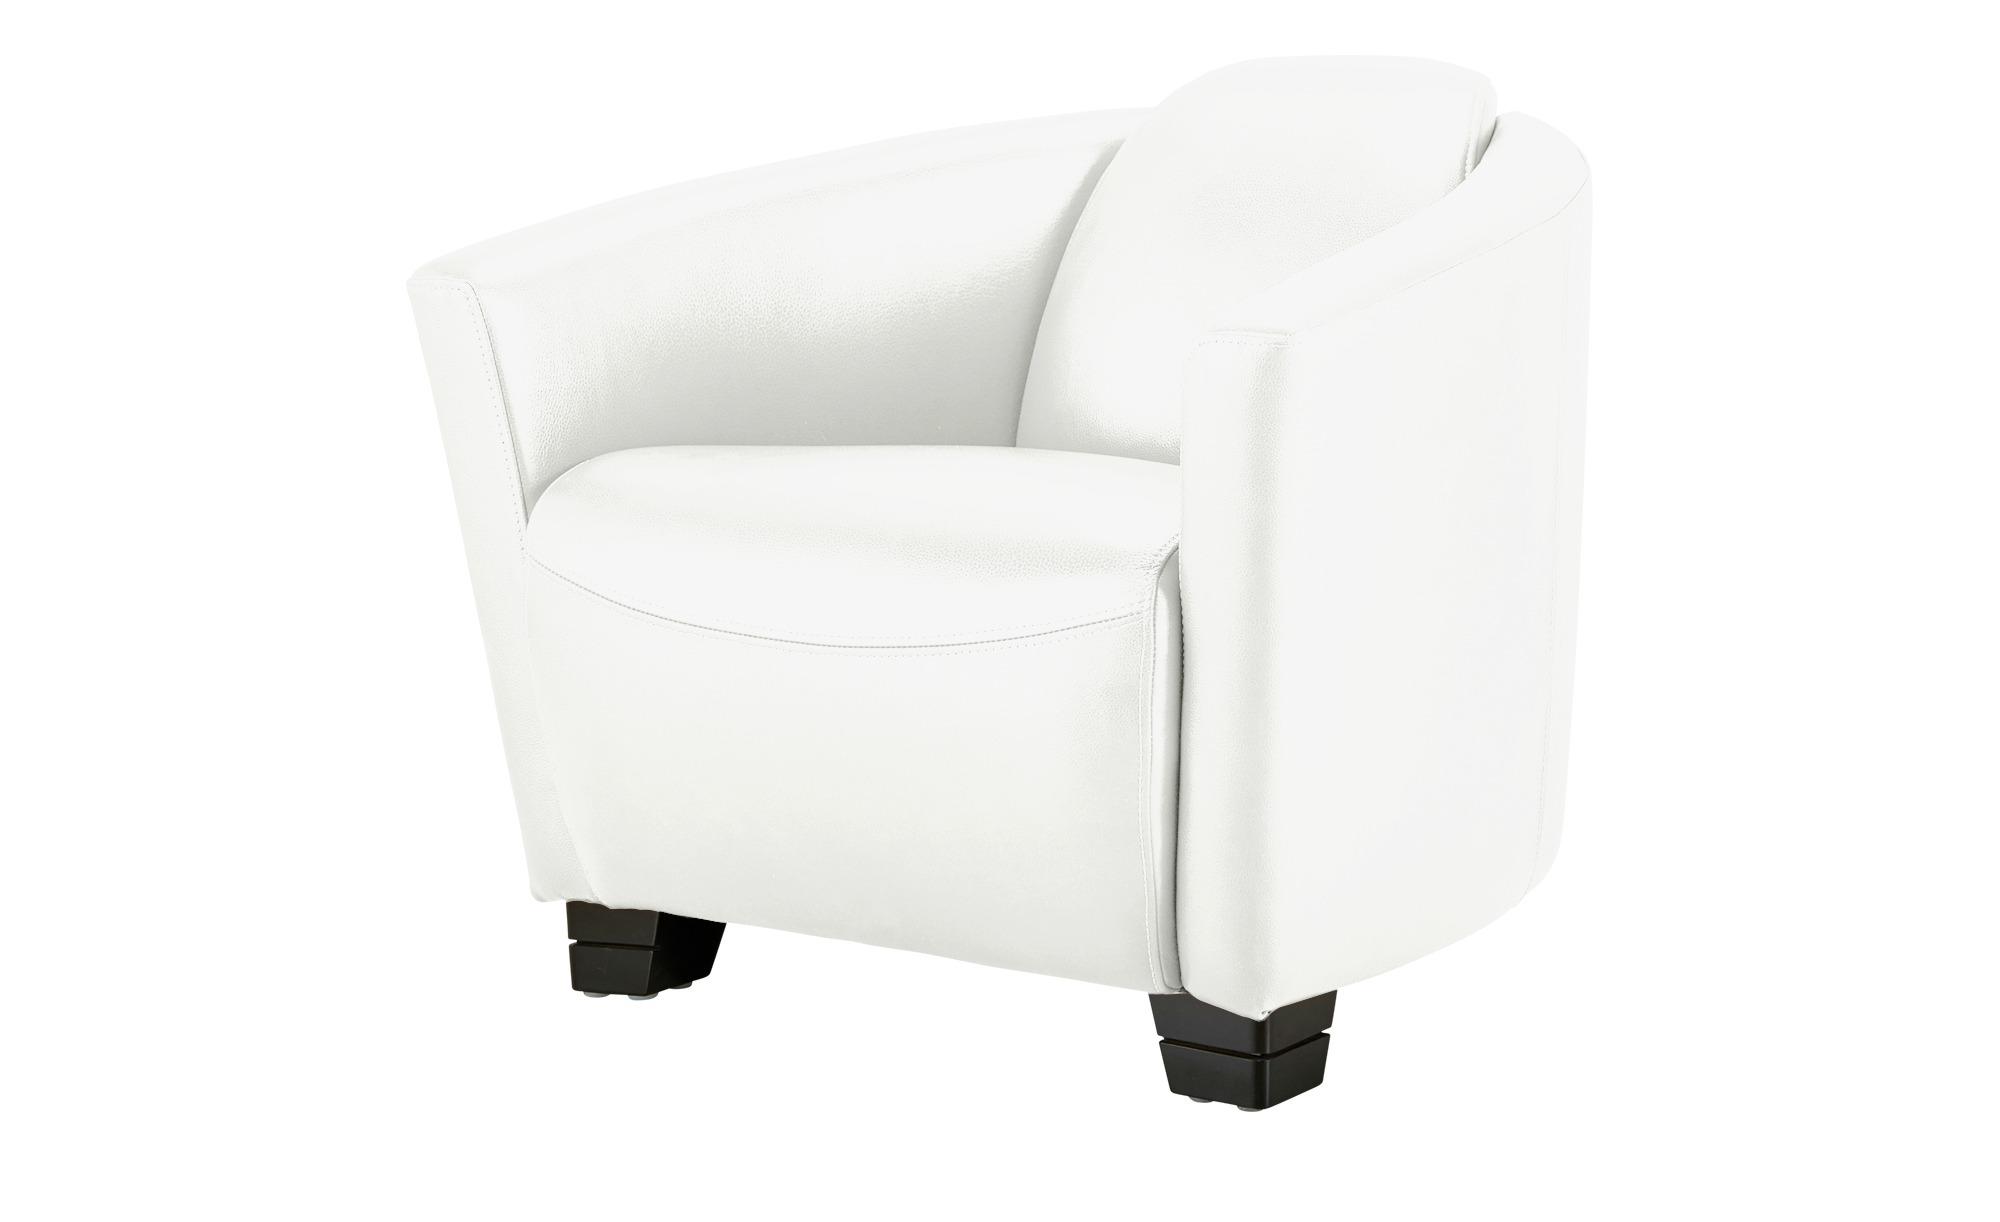 uno Ledersessel weiß - Leder Taylor ¦ weiß ¦ Maße (cm): B: 79 H: 73 T: 85 Polstermöbel > Sessel > Ledersessel - Höffner